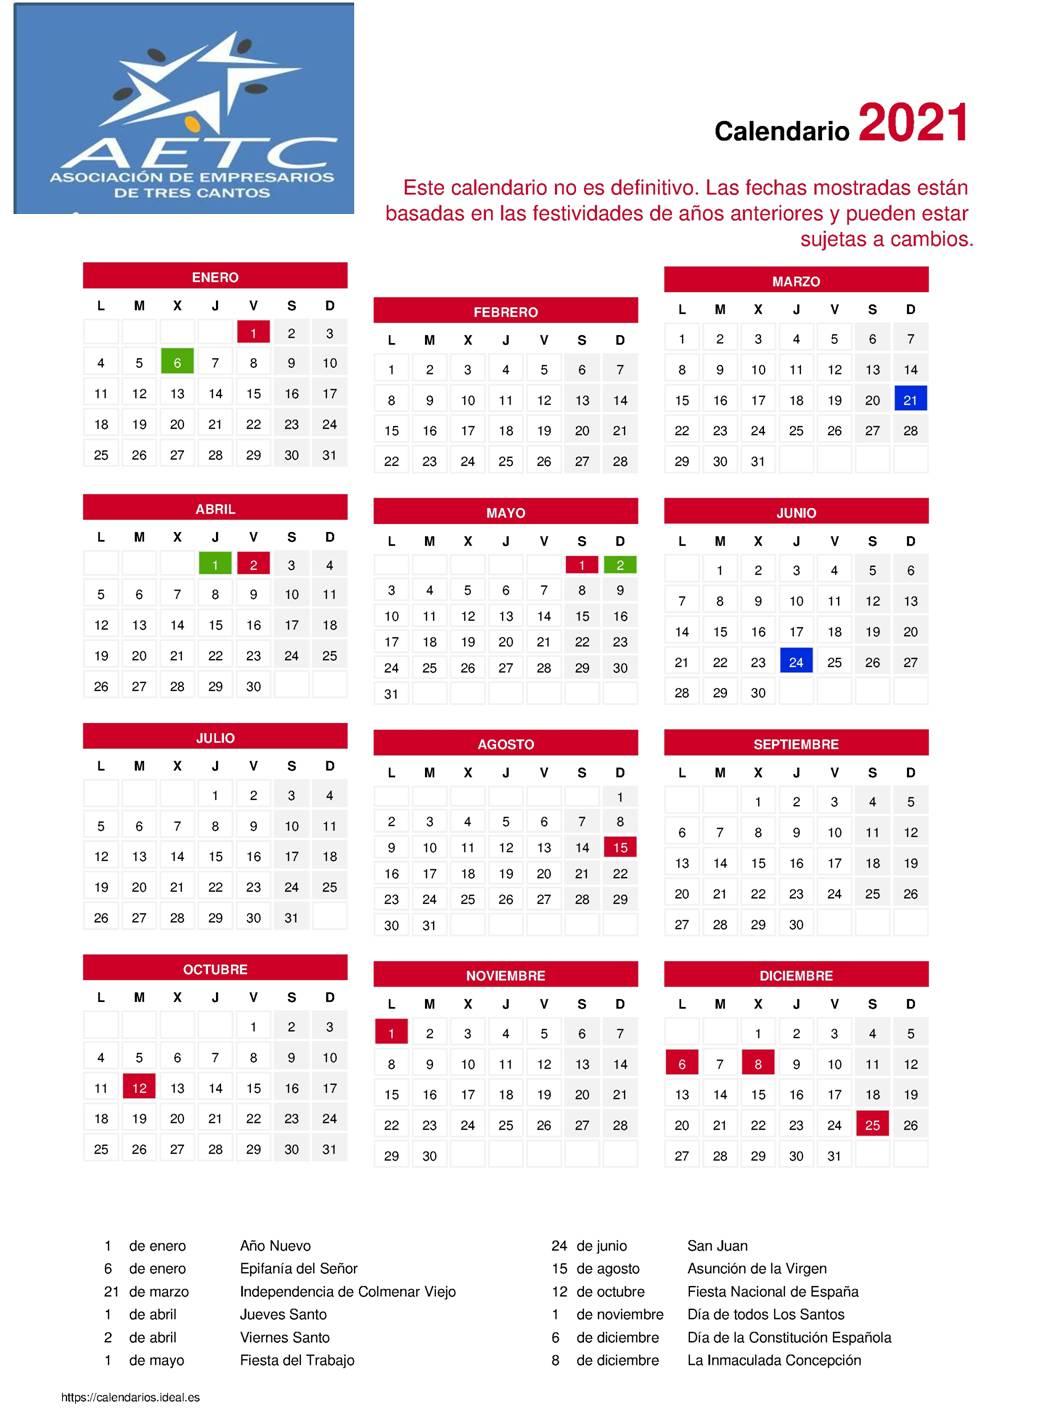 Calendario-Laboral-2021 - Asociación De Empresarios Tres